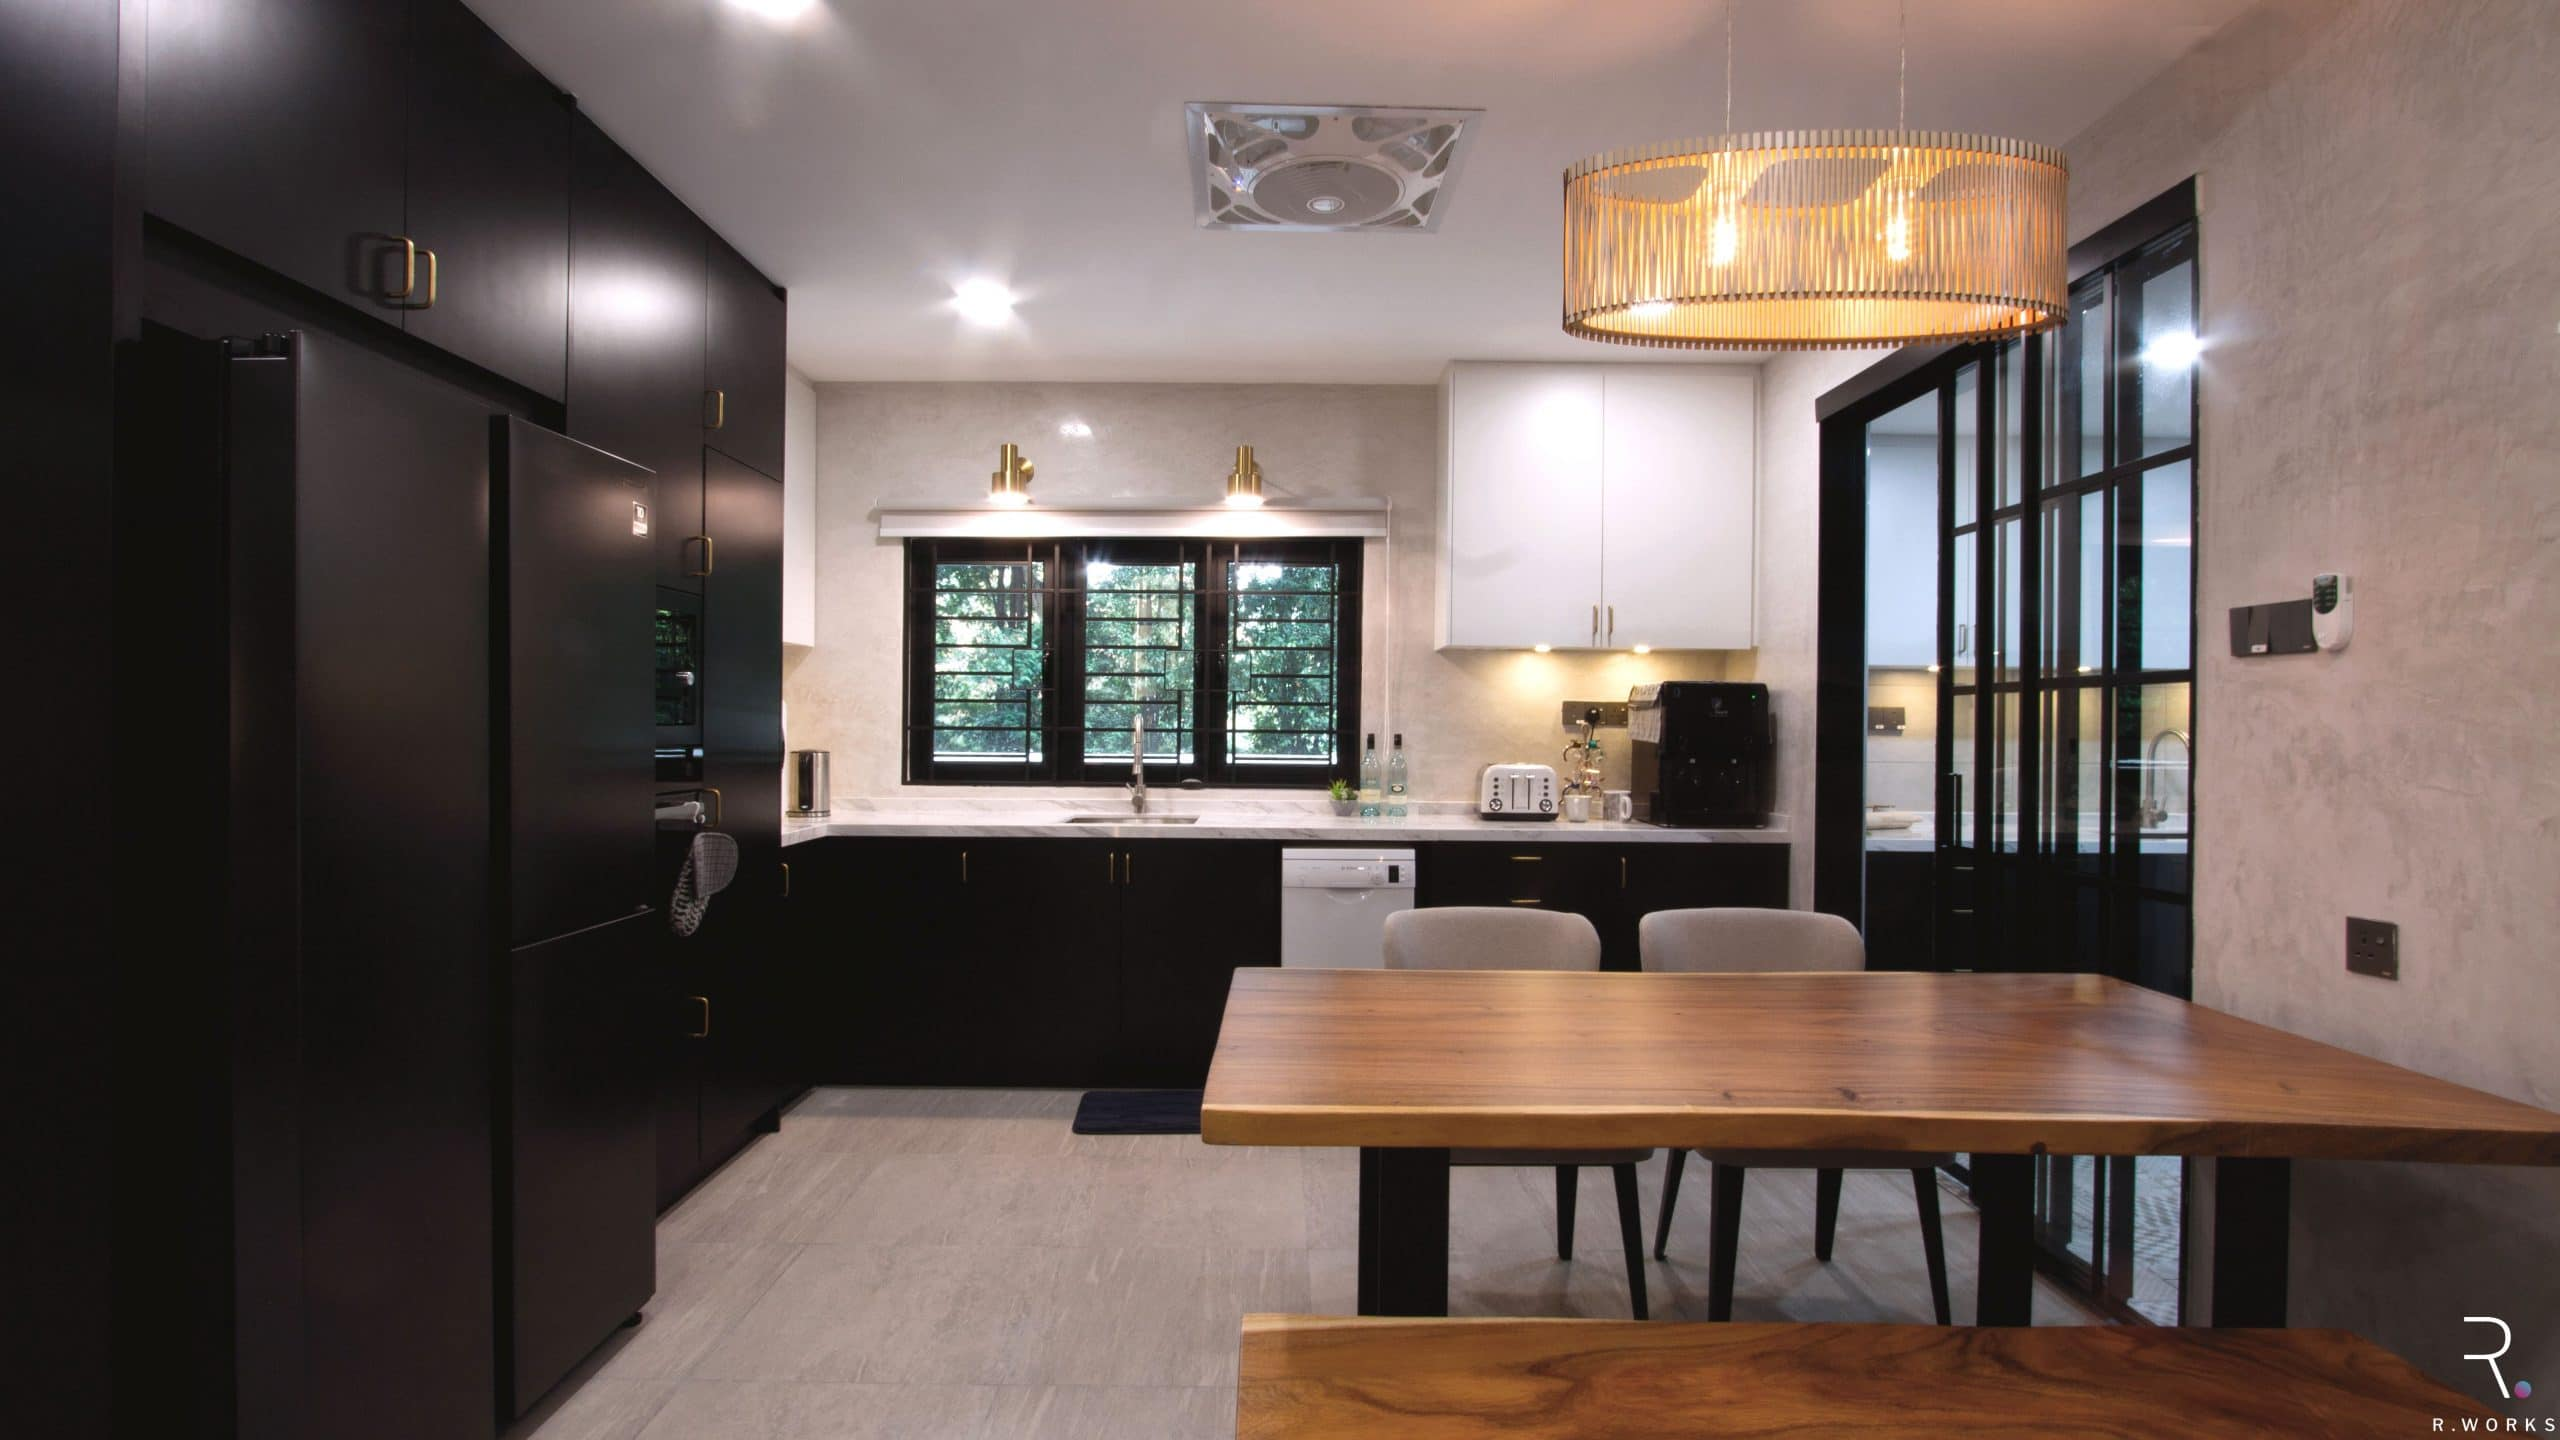 Townhouse dry kitchen modern after interior design